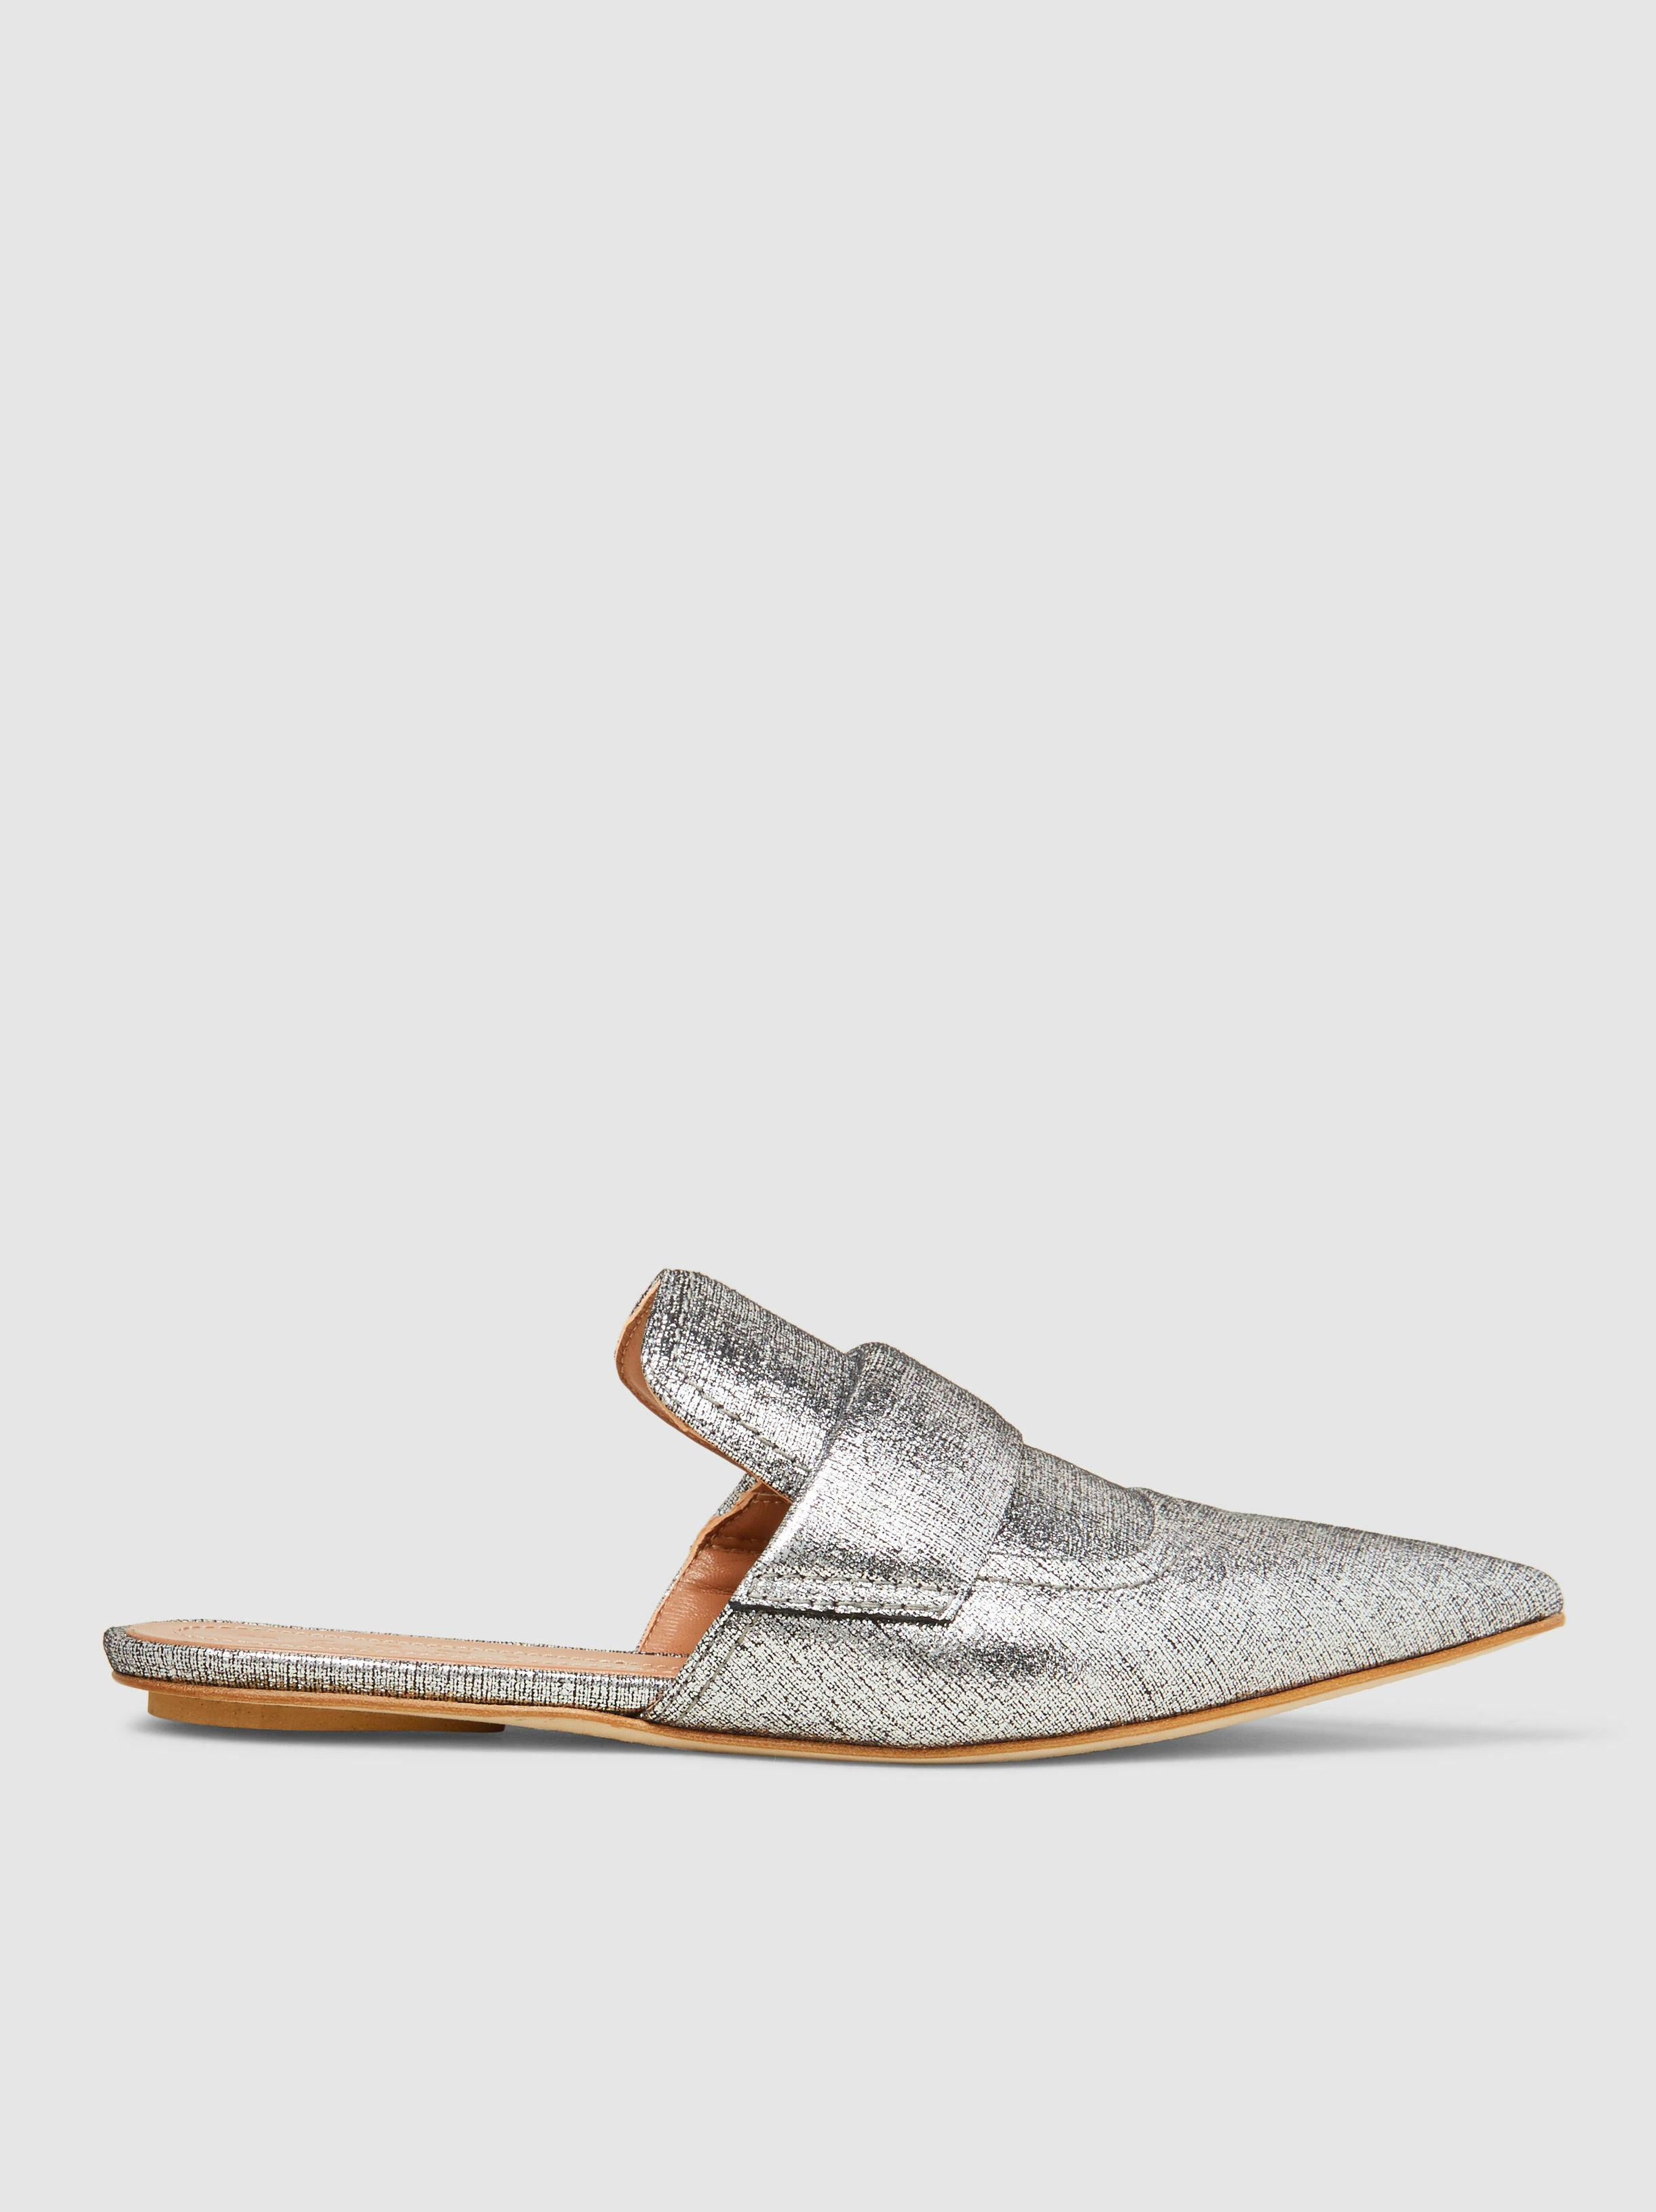 Marni Metallic Pointed-Toe Slippers bHG2tXvjU